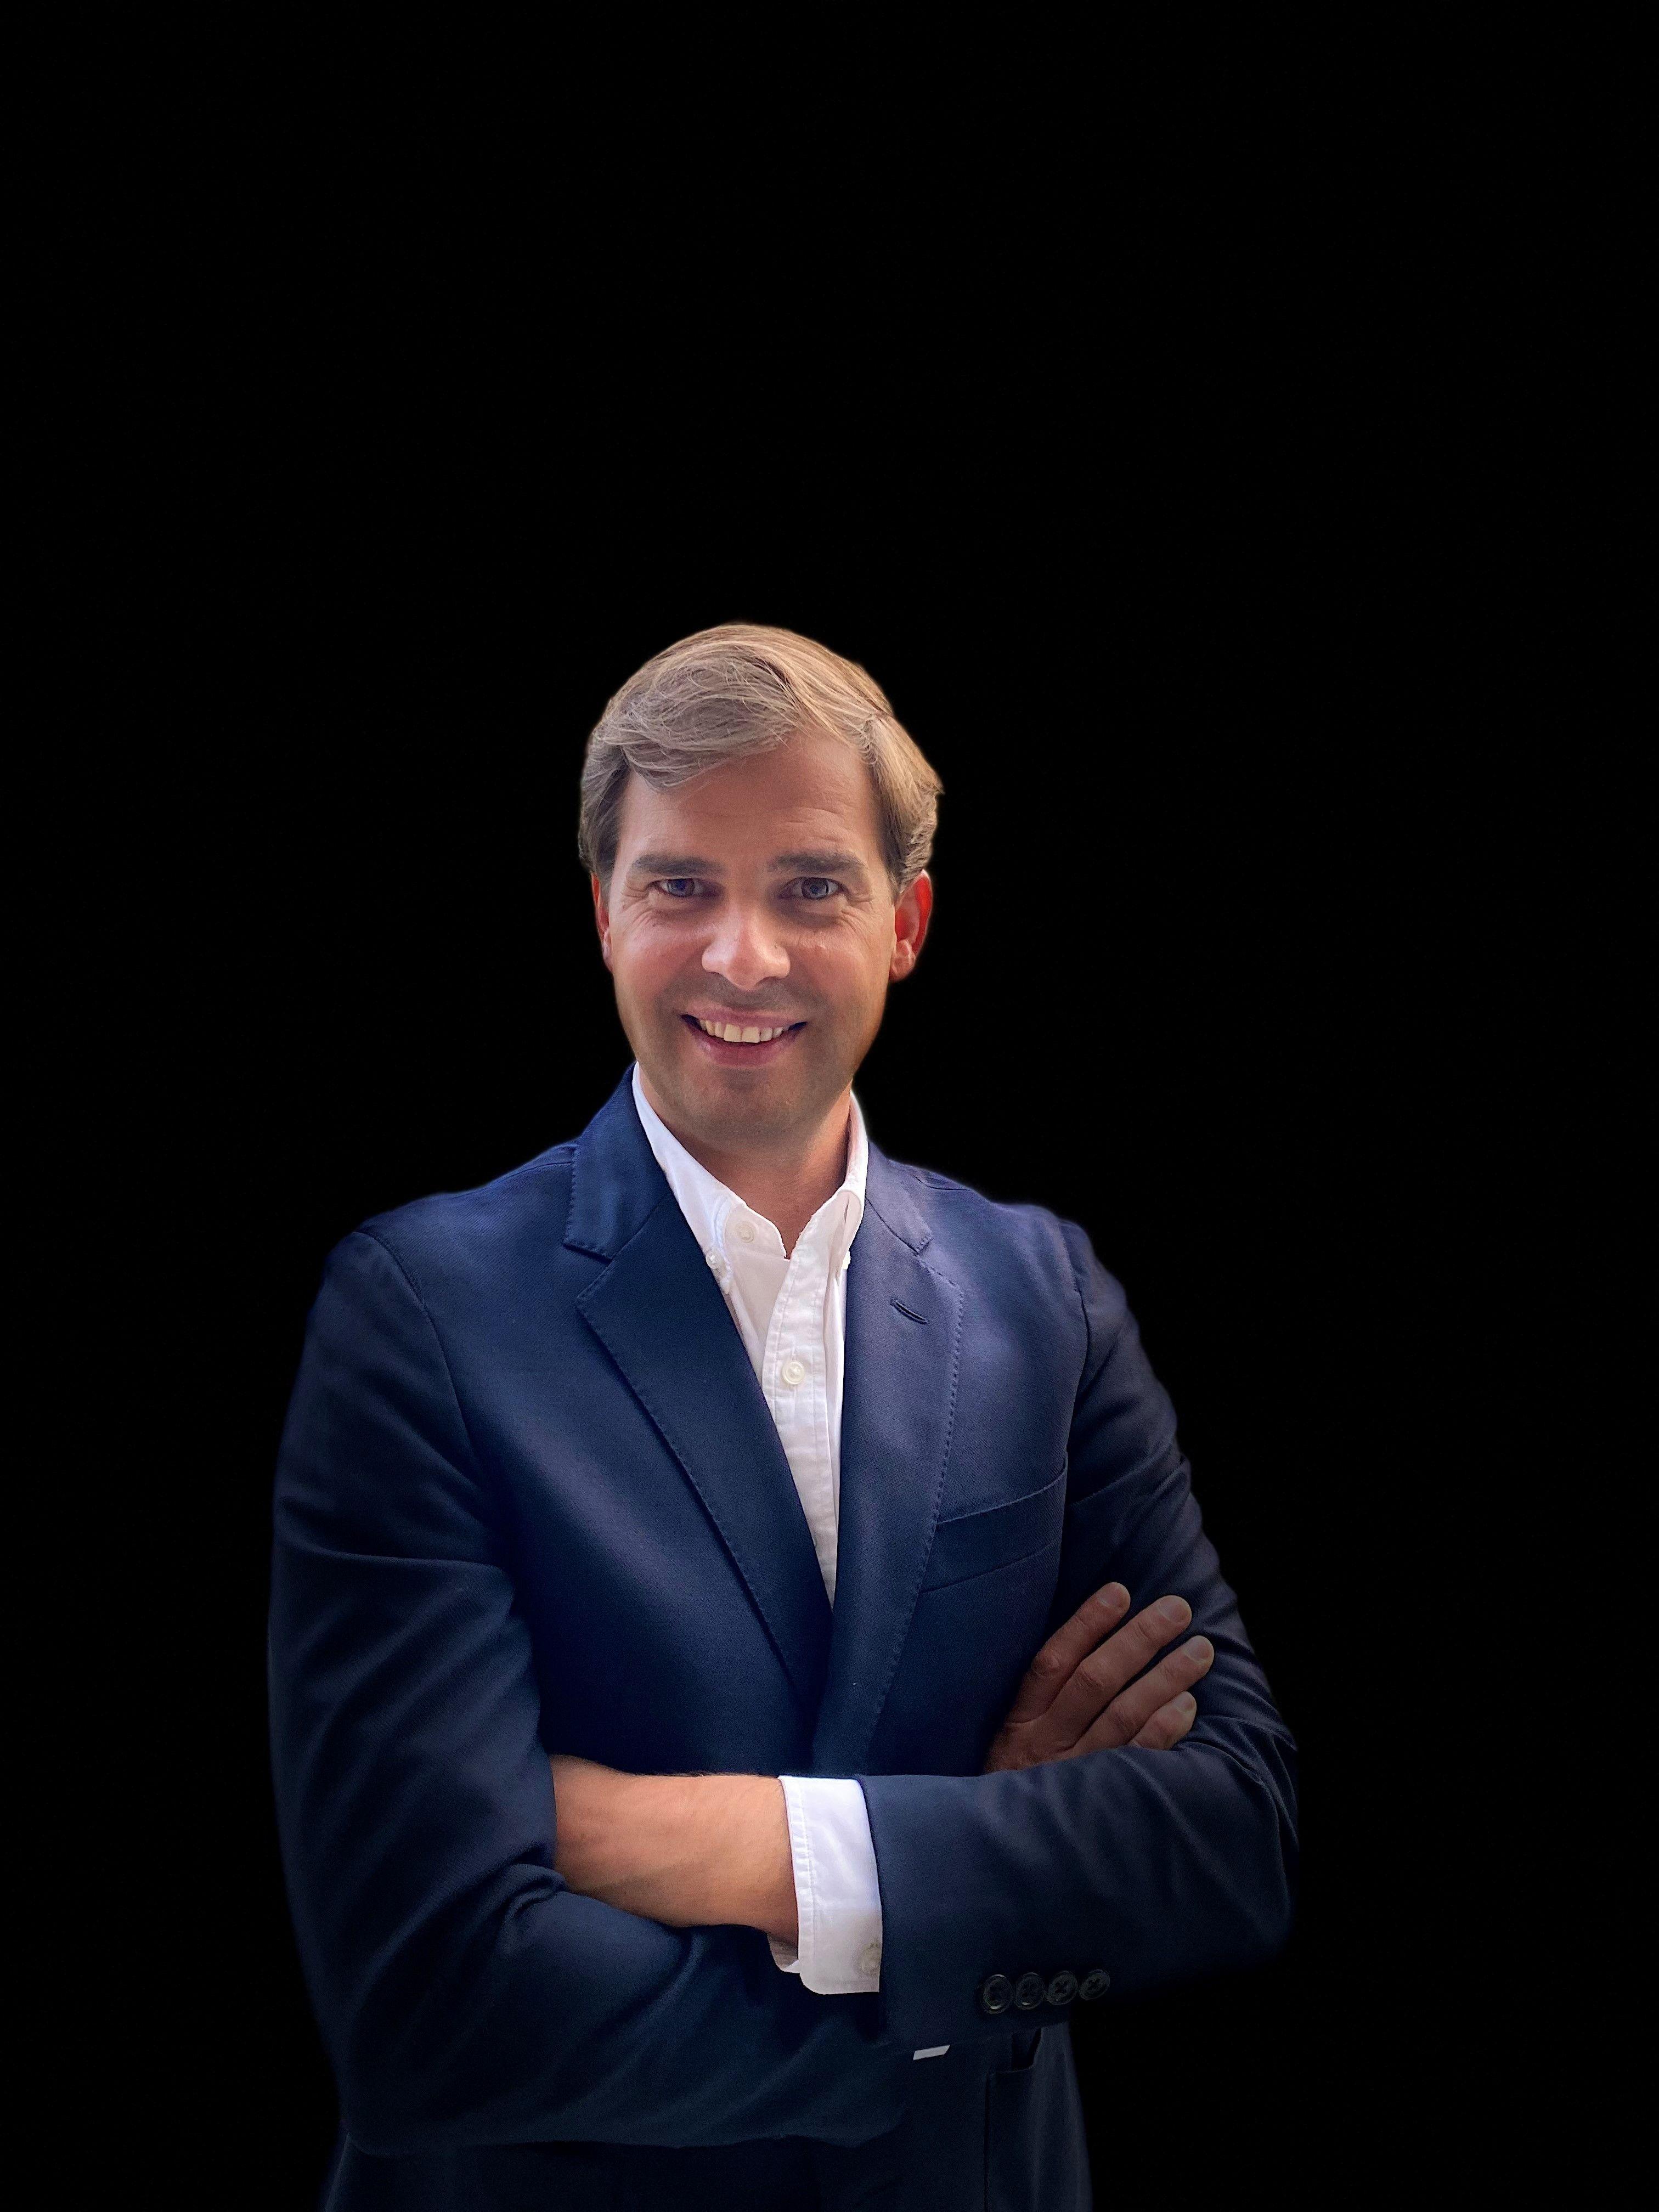 Martim Avillez Oliveira